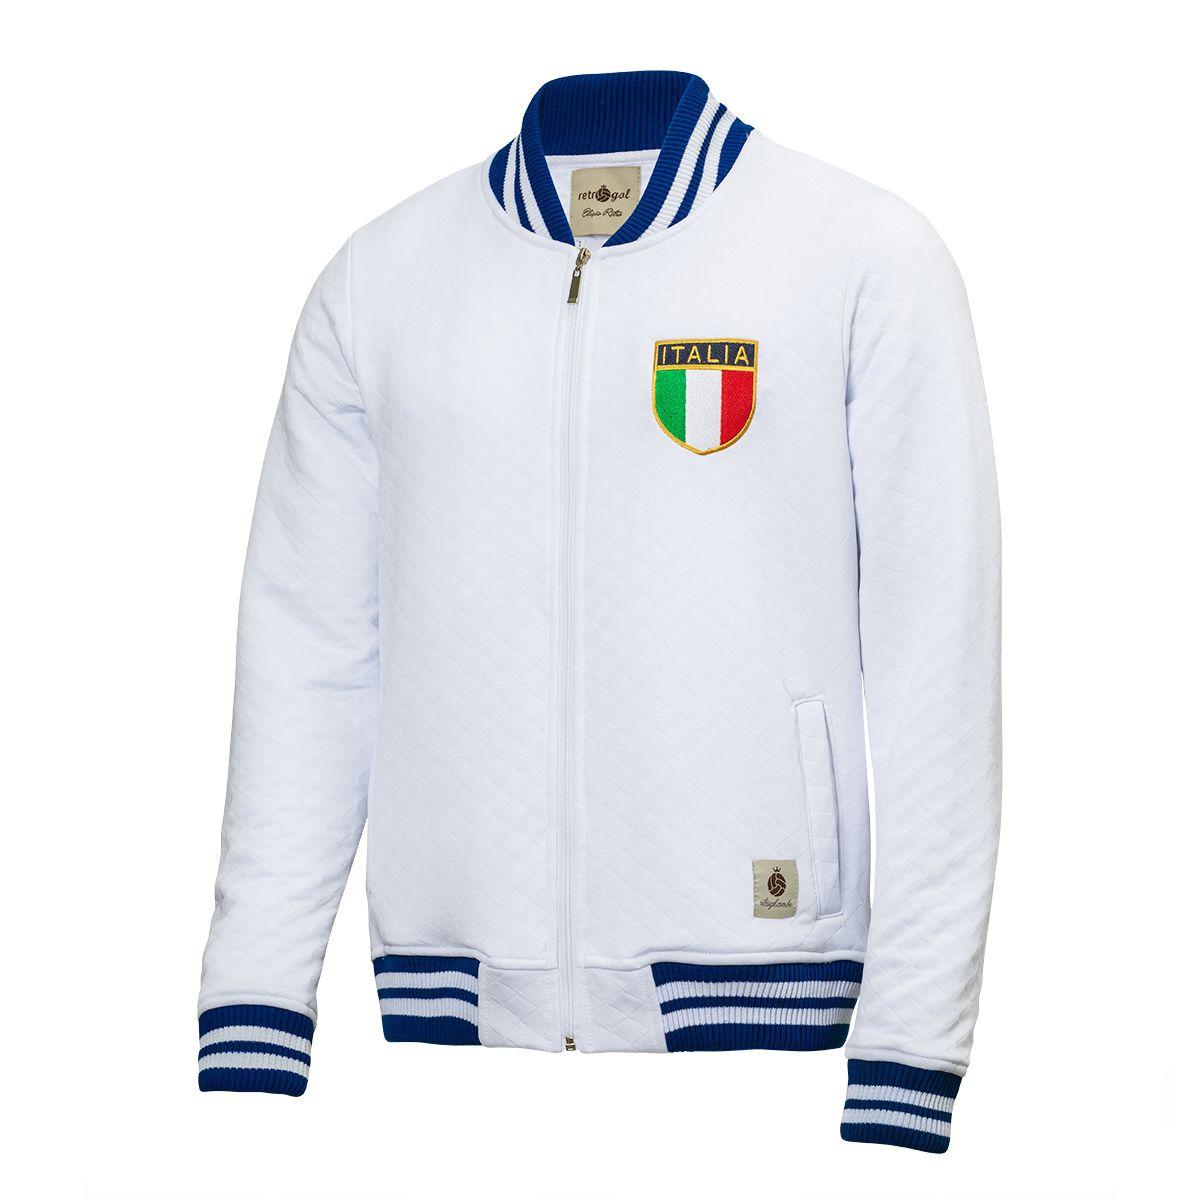 c2bb11e36 Jaqueta Itália Retrô Gol Classic Masculina